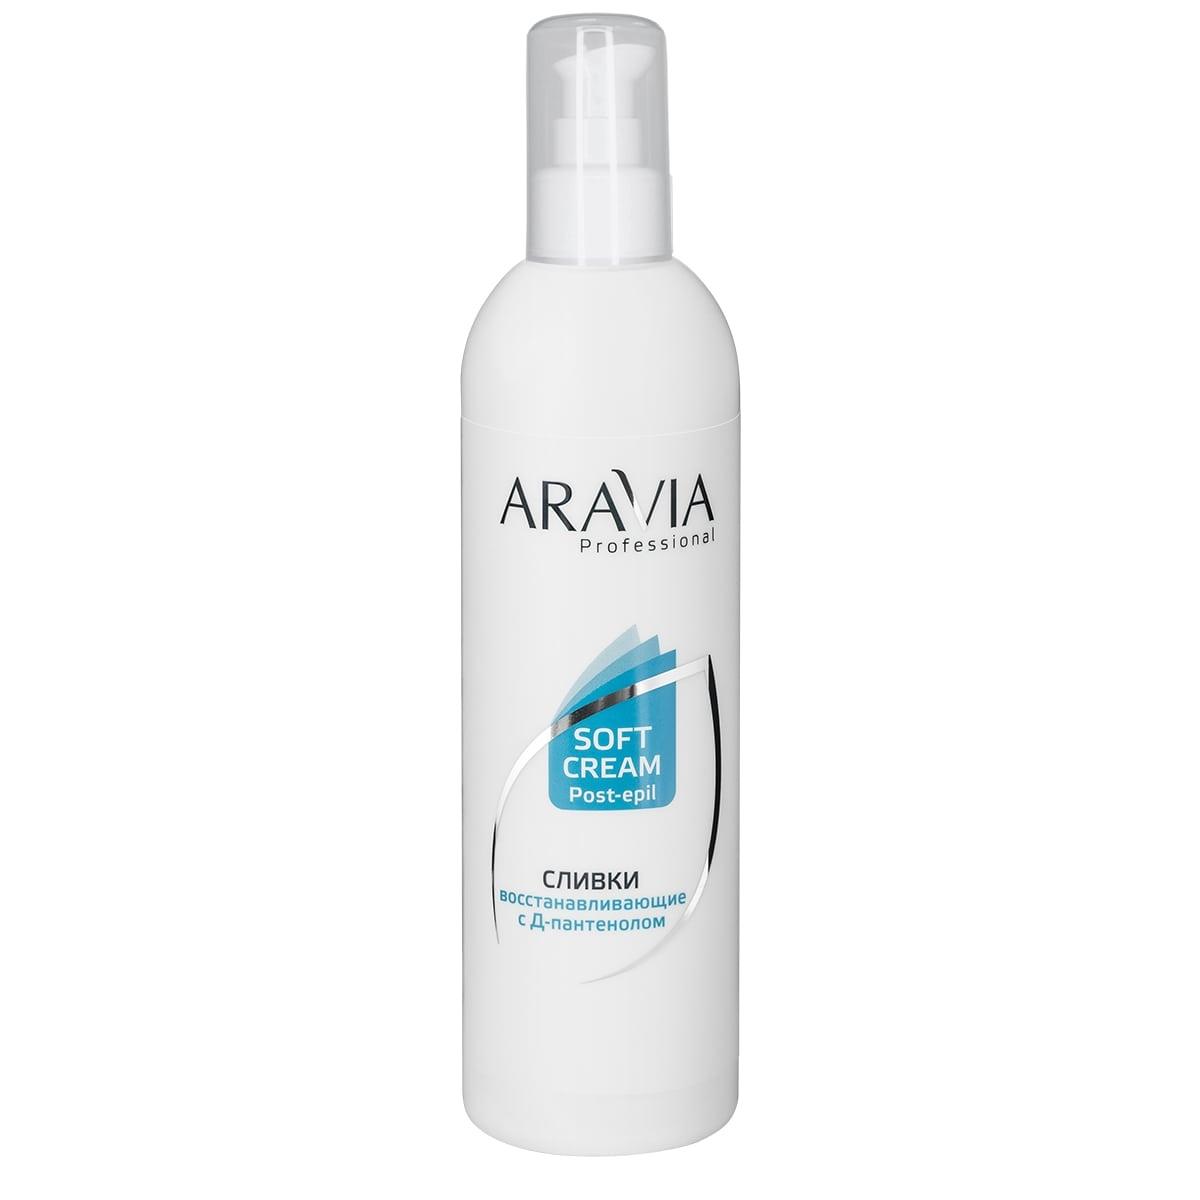 ARAVIA Сливки восстанавливающие с Д-пантенолом, 300 мл aravia сливки для восстановления рн кожи с маслом иланг иланг 150 мл